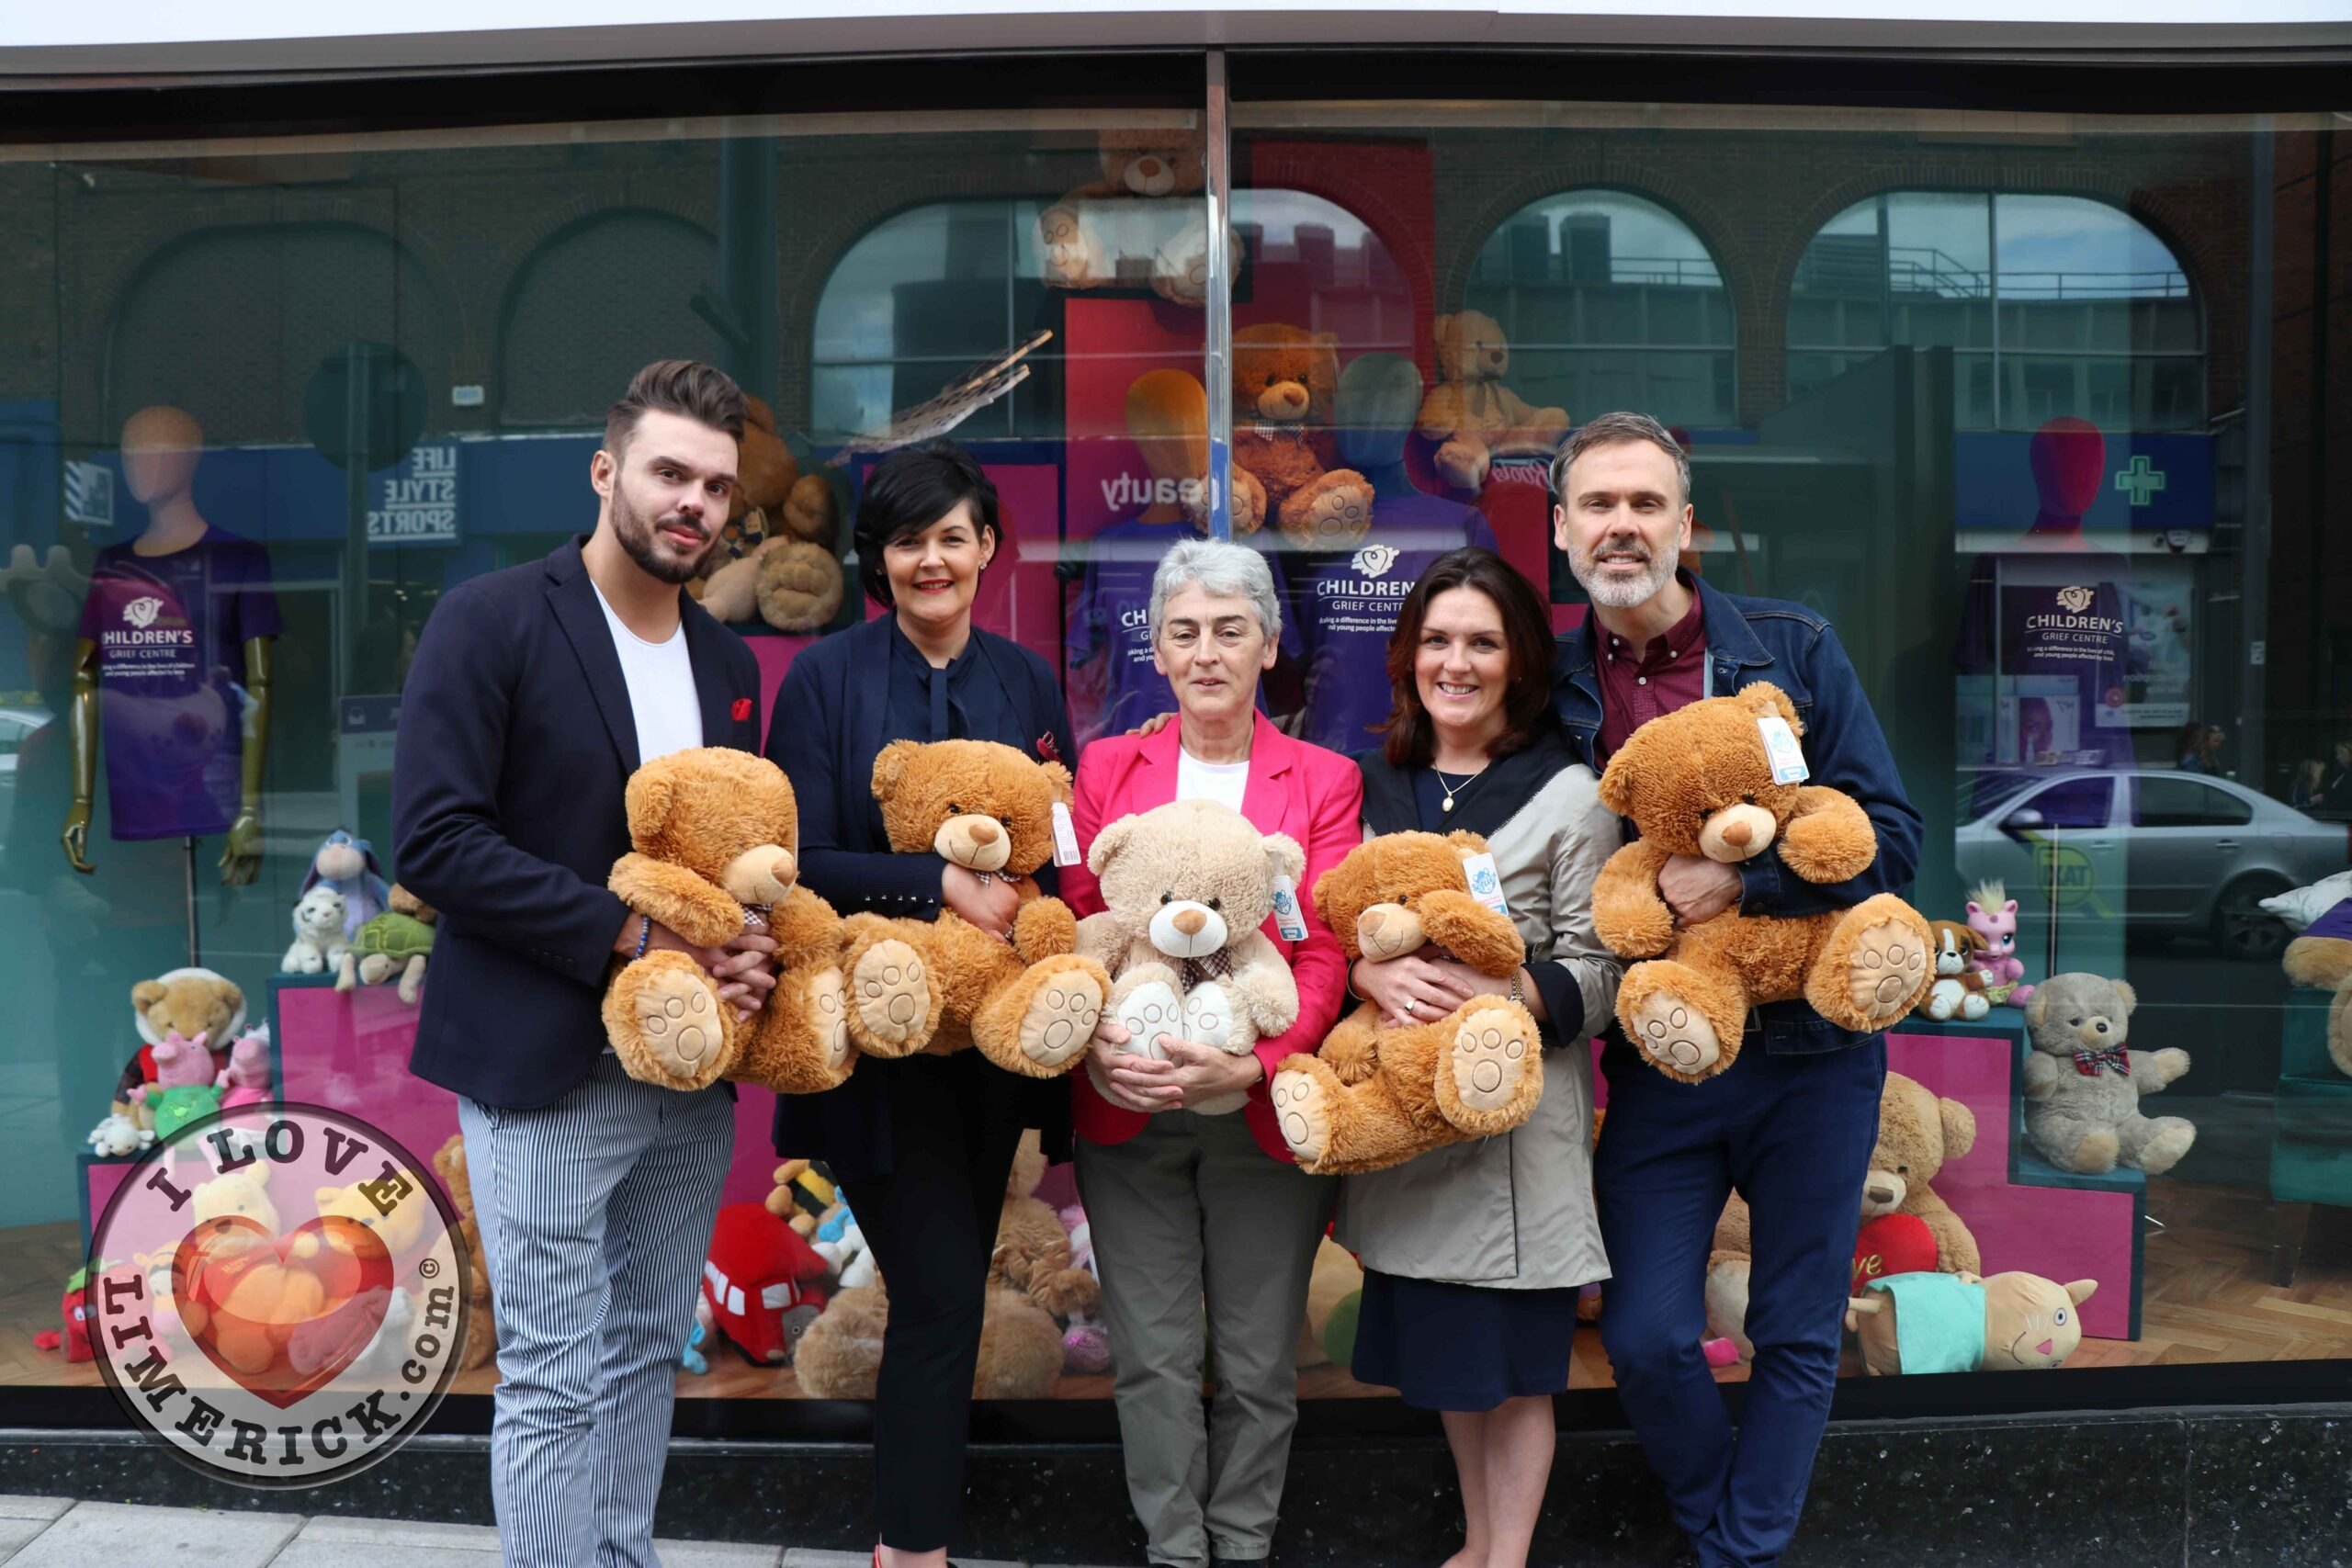 Brown Thomas charity partner